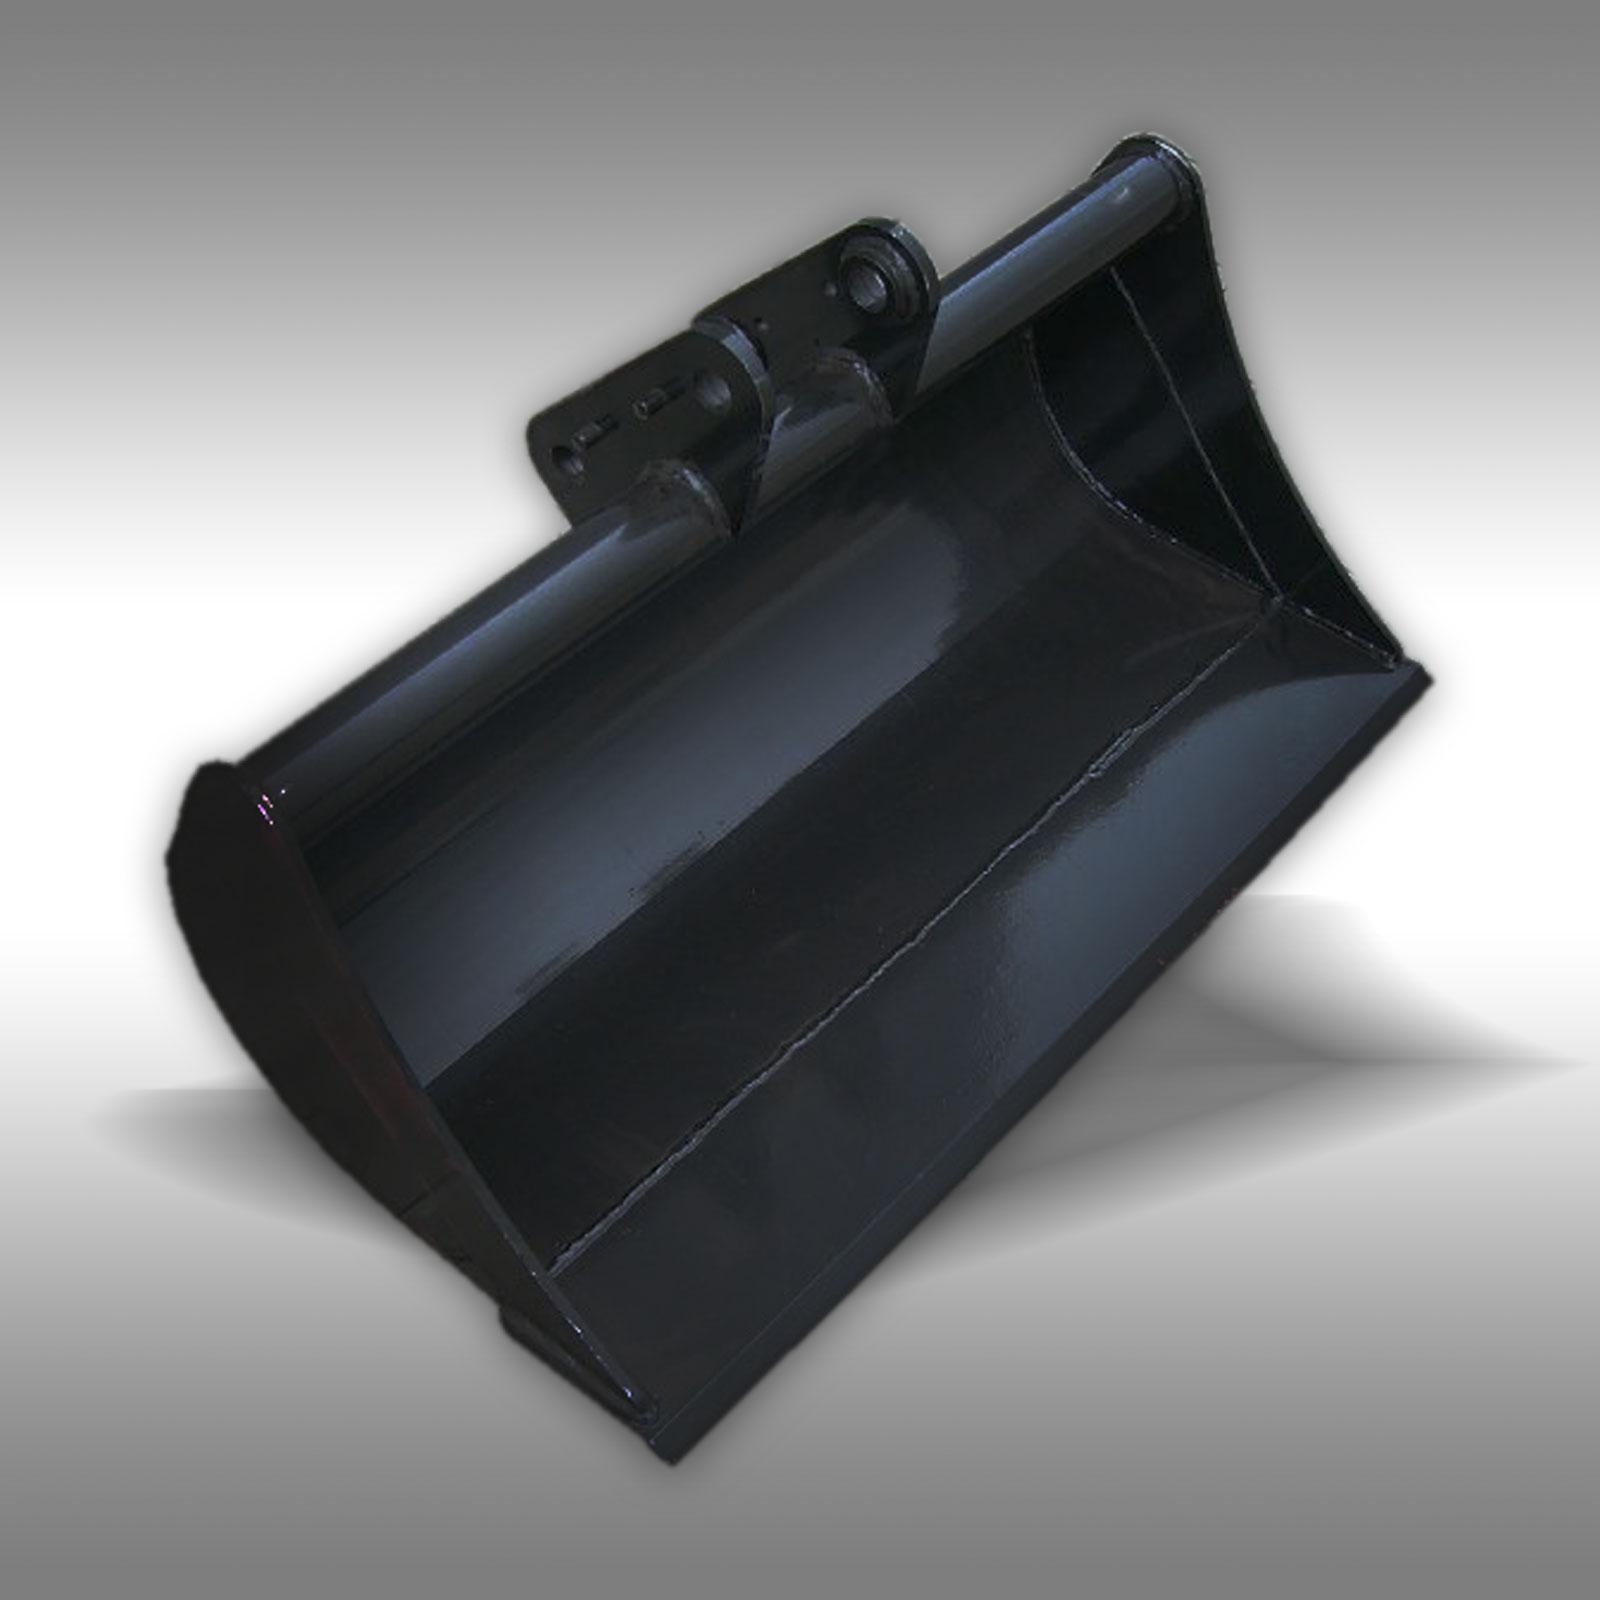 Jansen Graafbak 900 mm voor graafmachines  BHM / BHSM